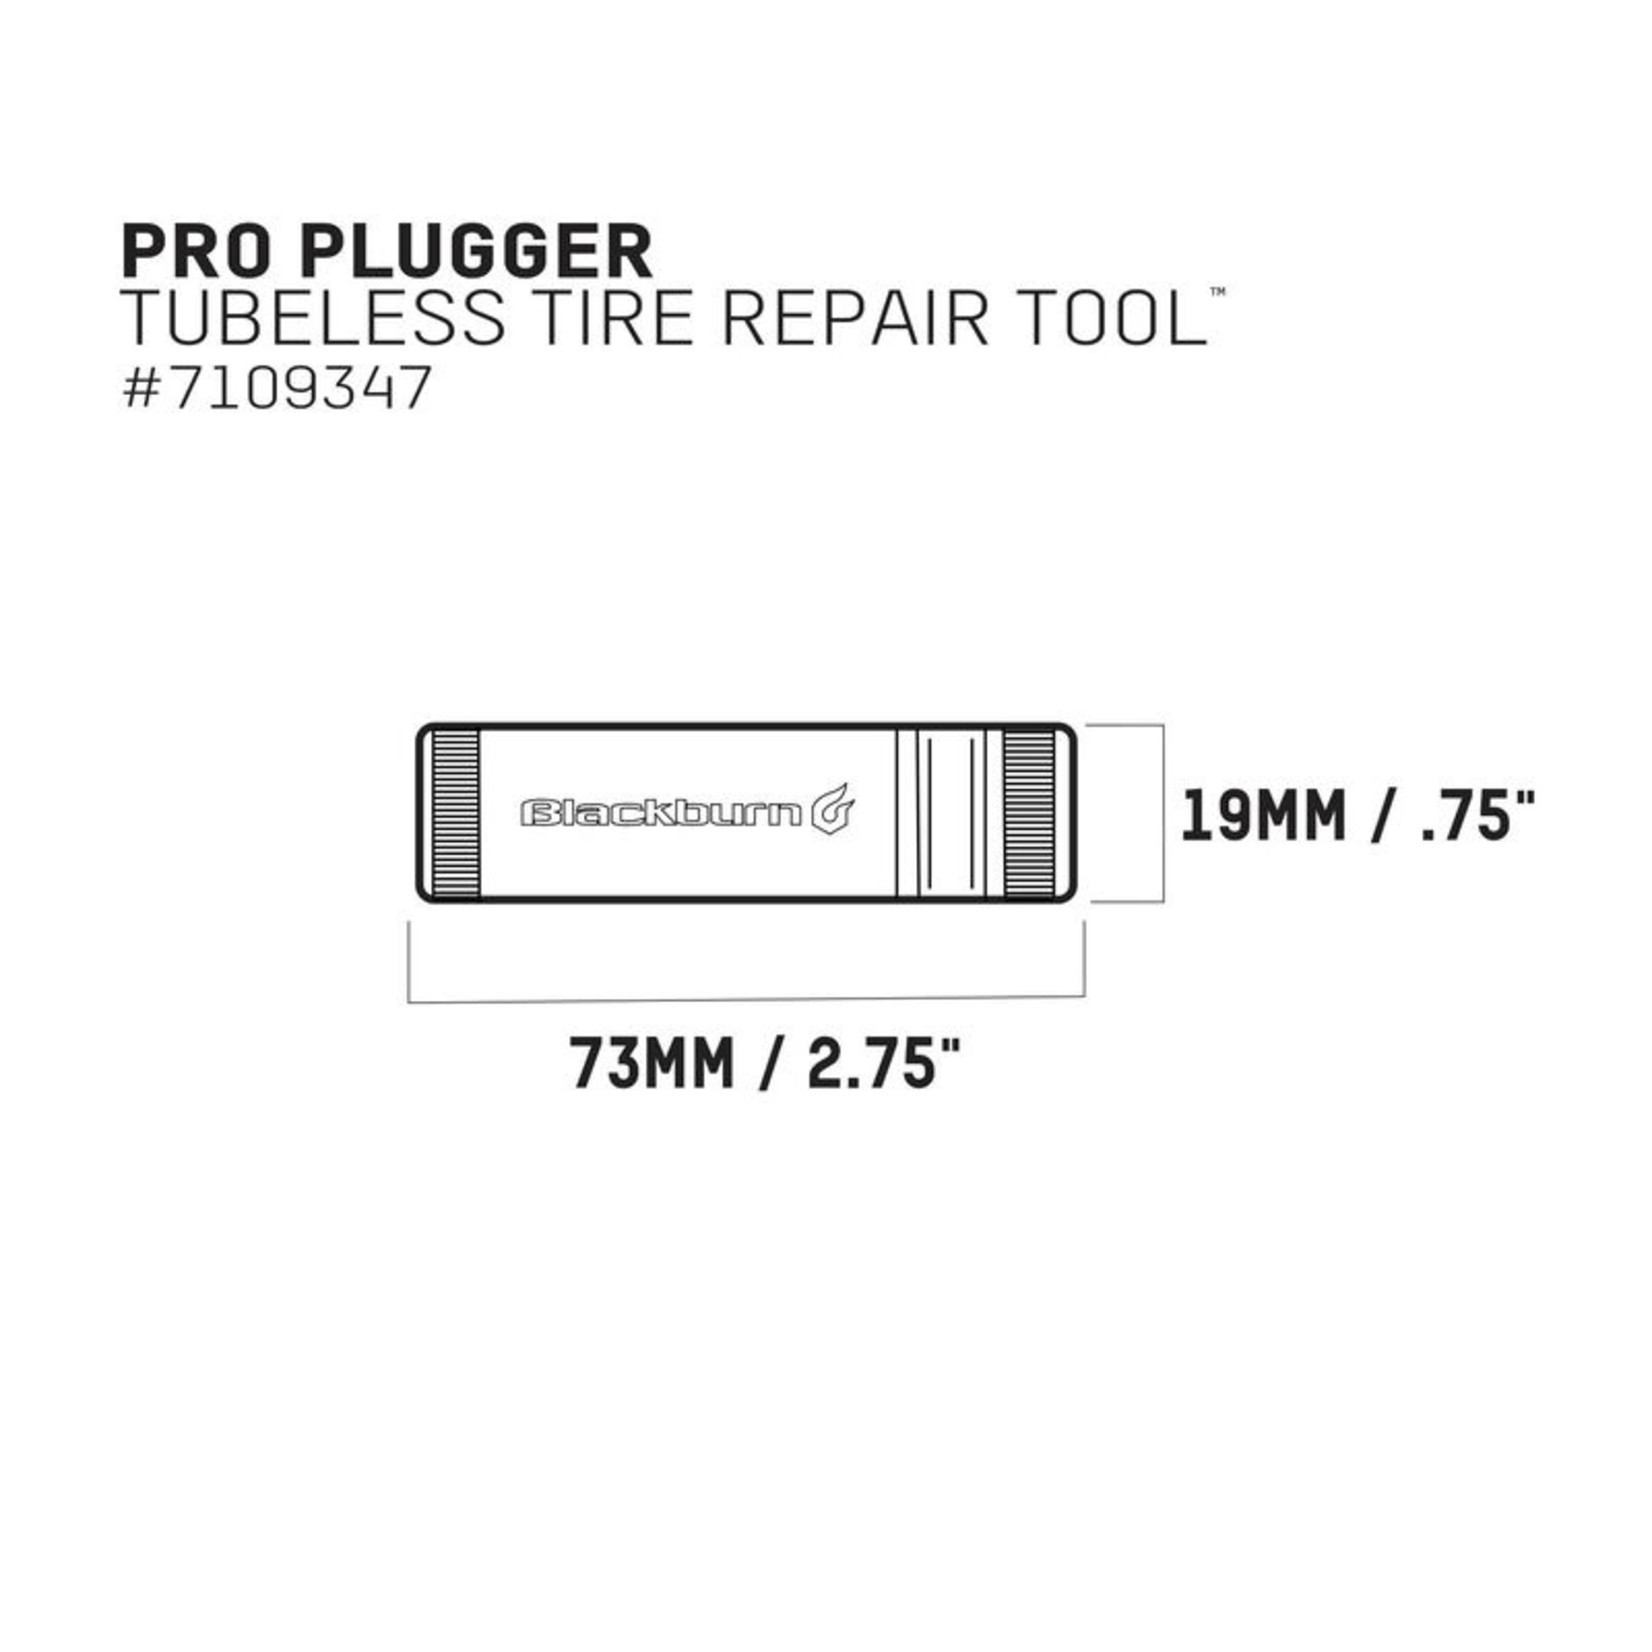 BLACKBURN Tools - PRO Plugger Tire Repair